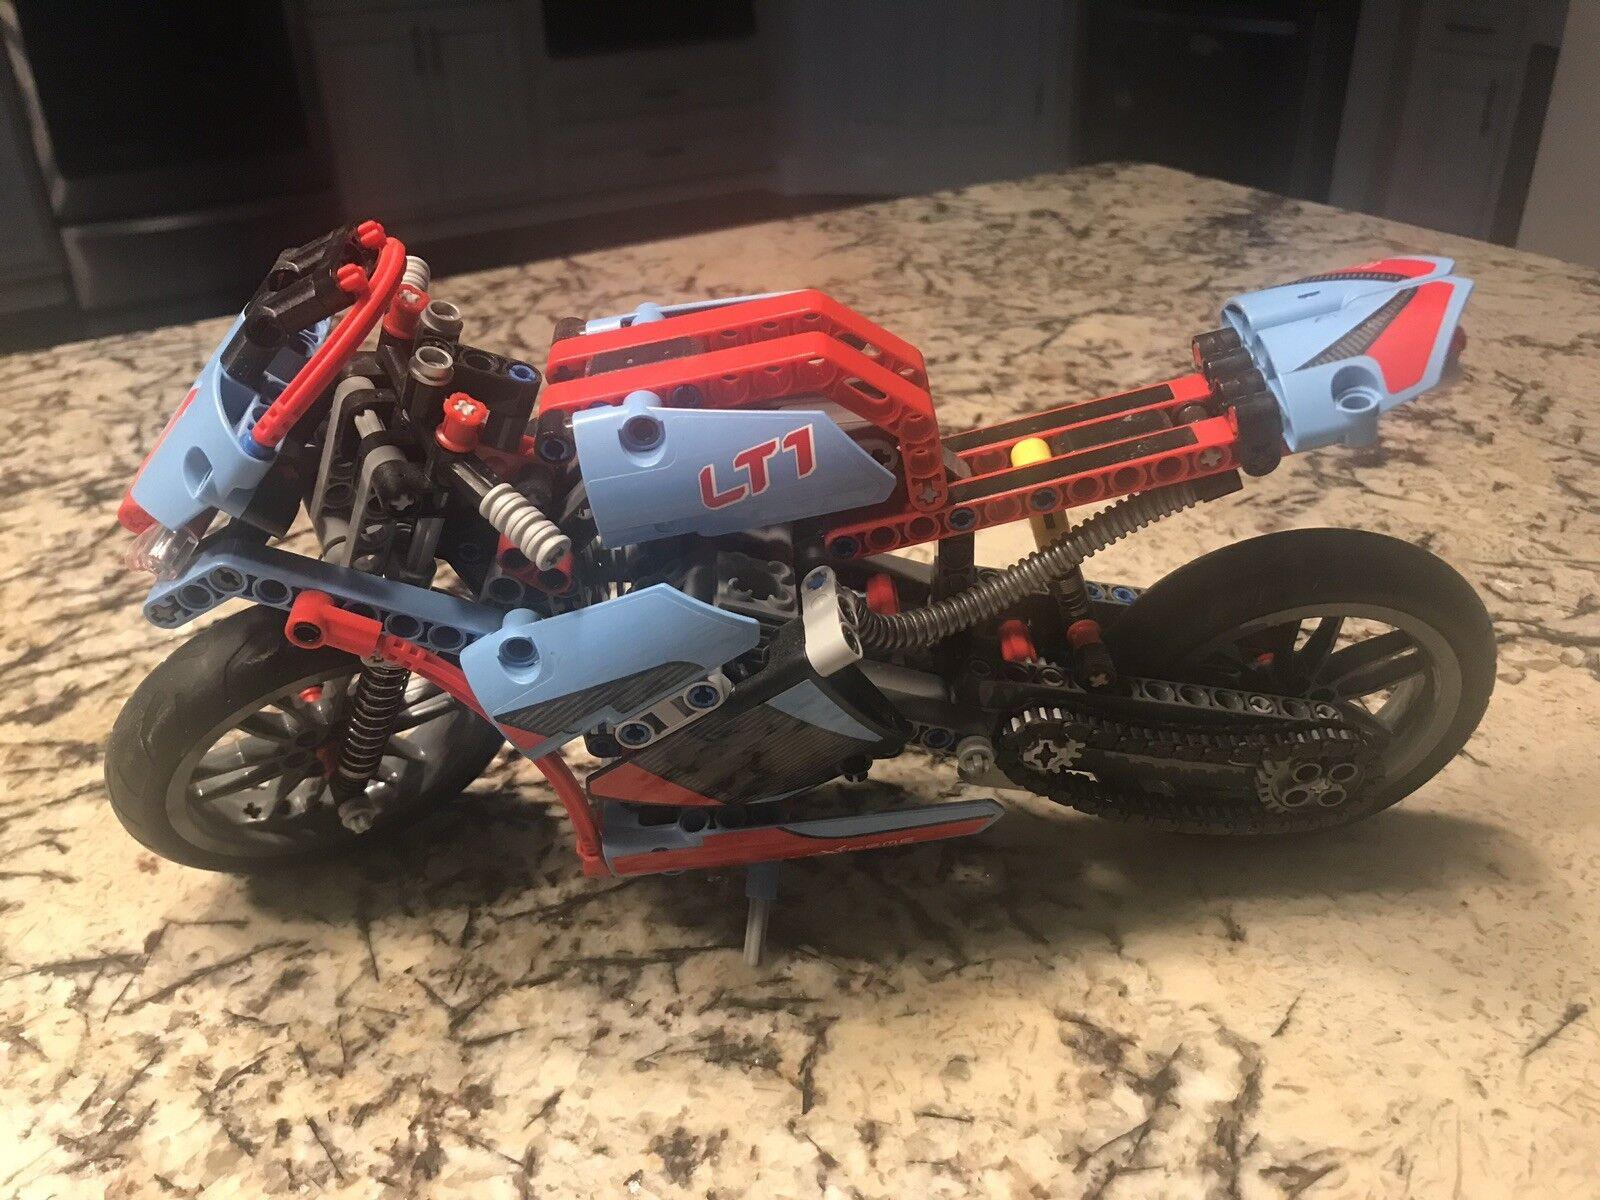 Lego Technic 42036 2 In 1 Street Motorcycle